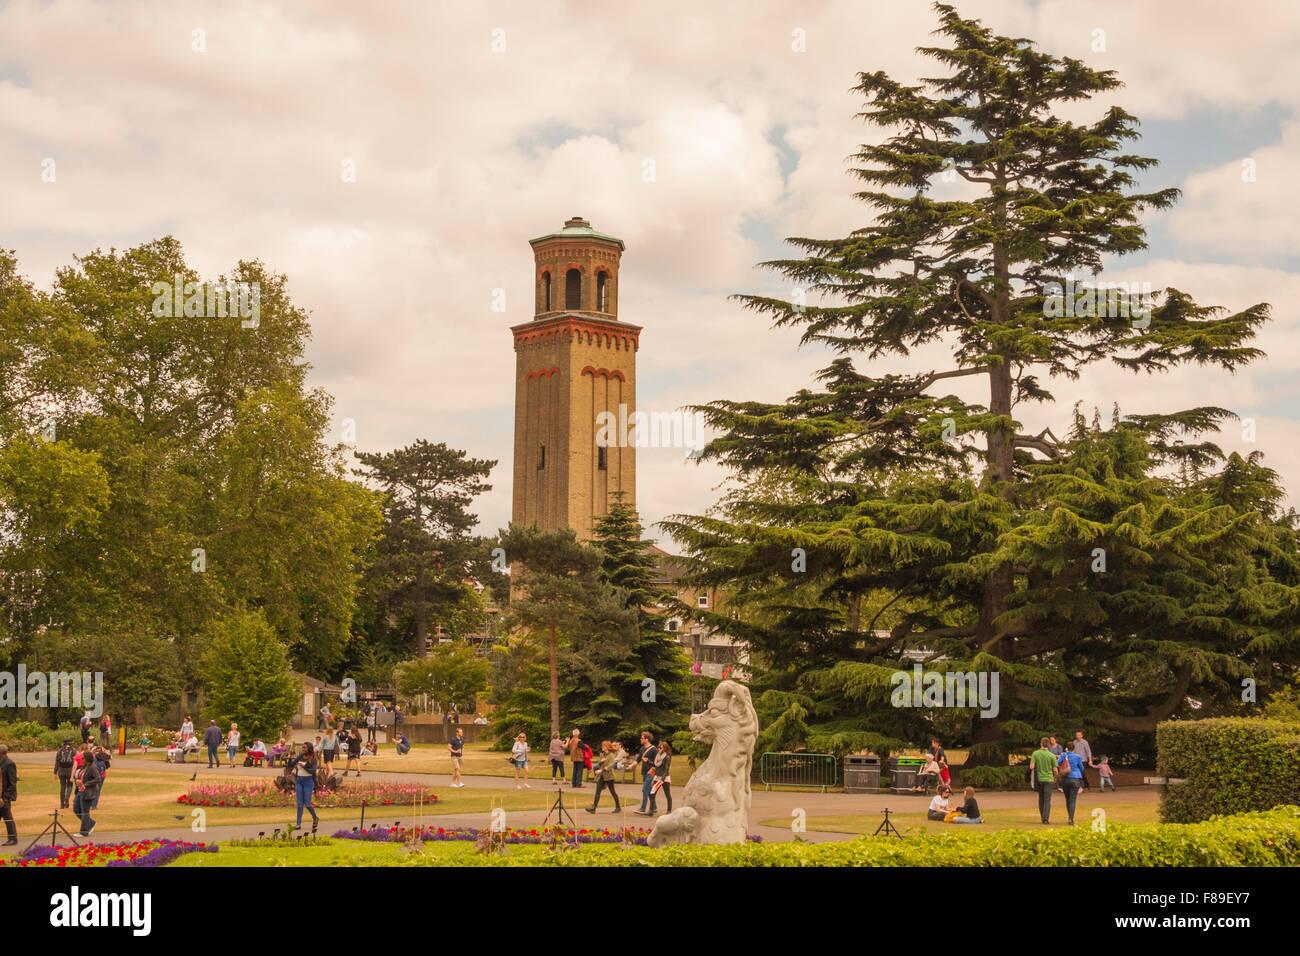 Victorian Tower Gardens Stock Photos & Victorian Tower Gardens Stock ...